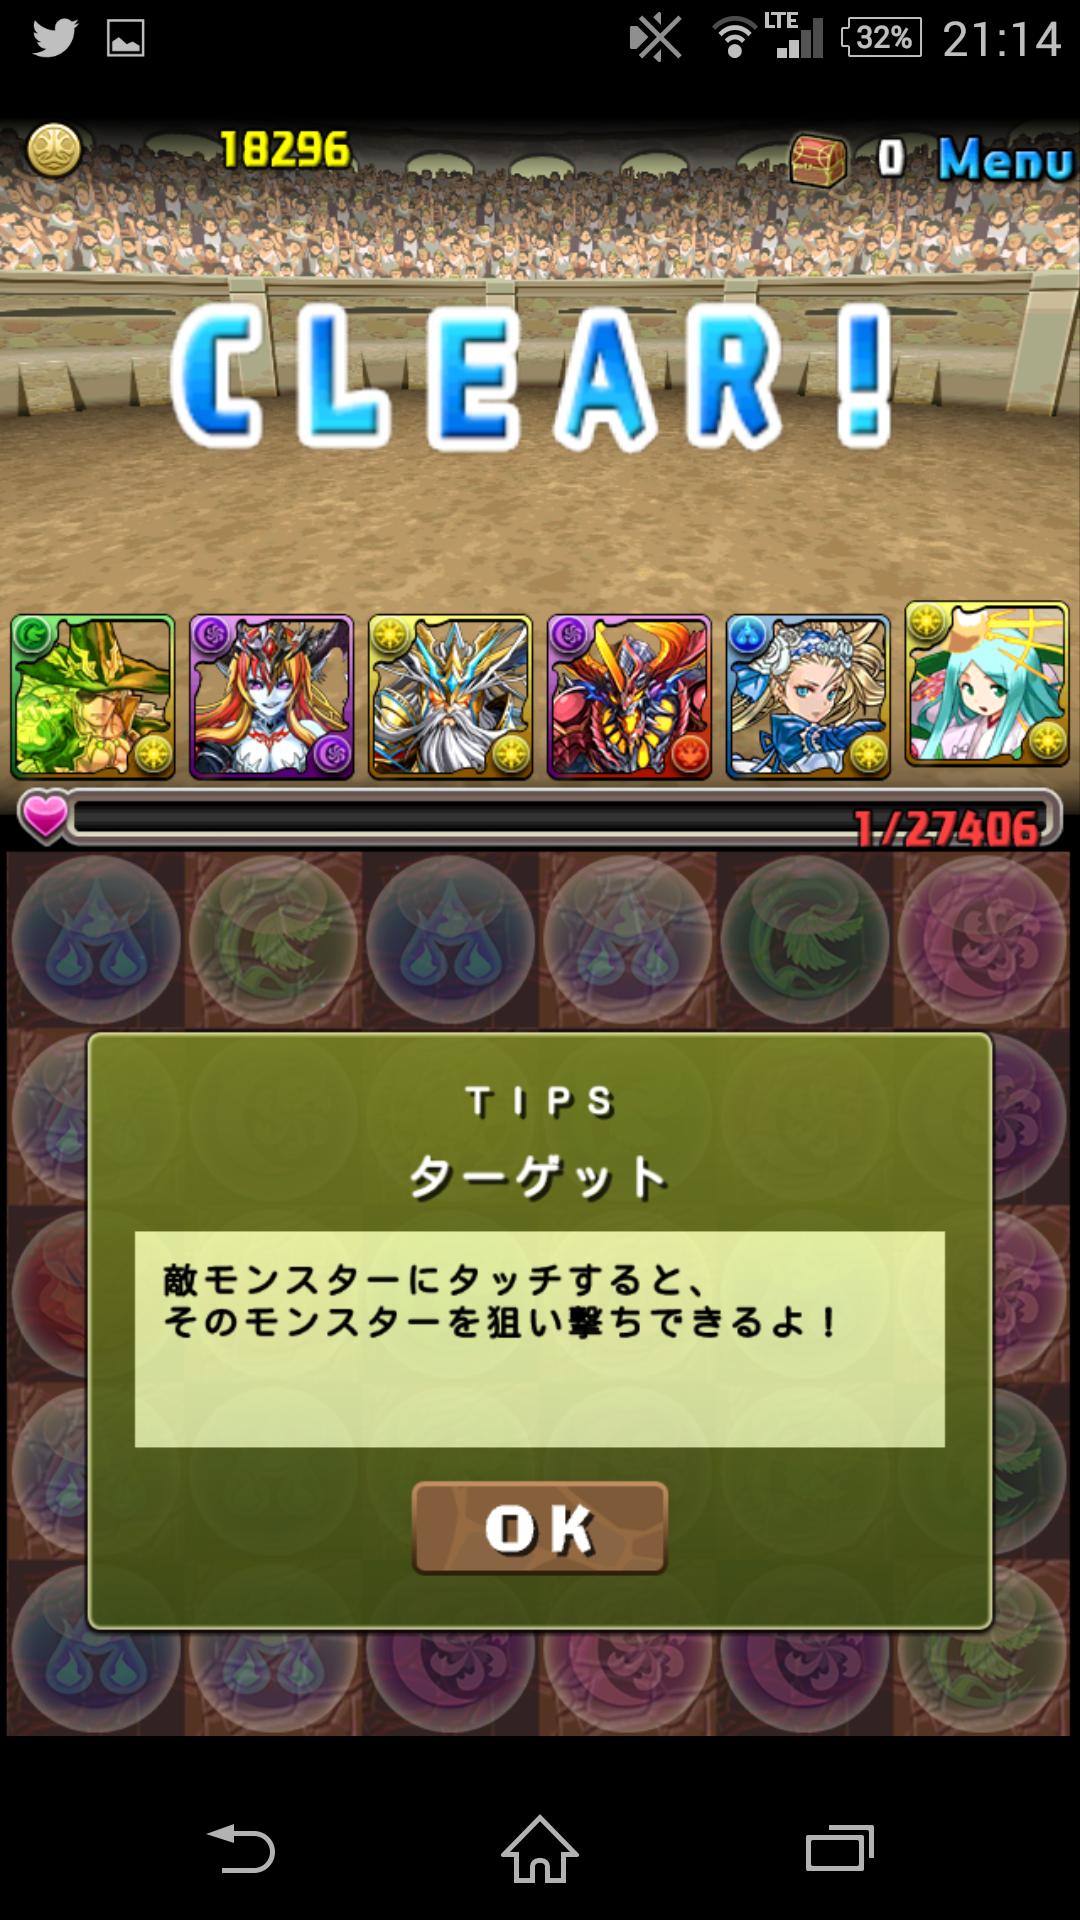 Screenshot_2015-01-29-21-14-13.png